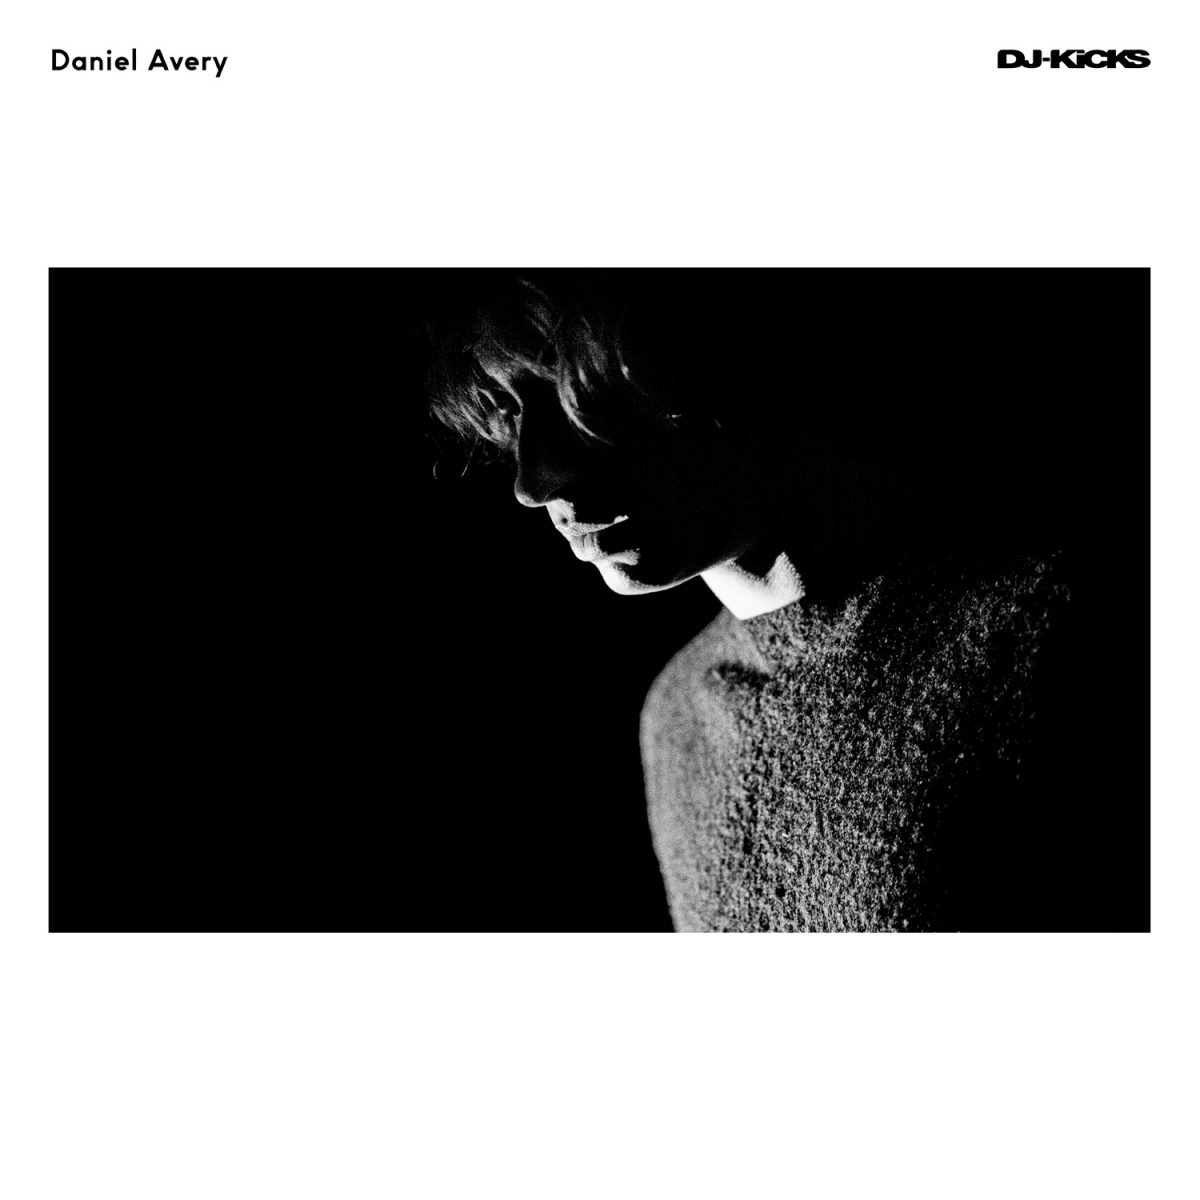 Daniel Avery - DJ Kicks